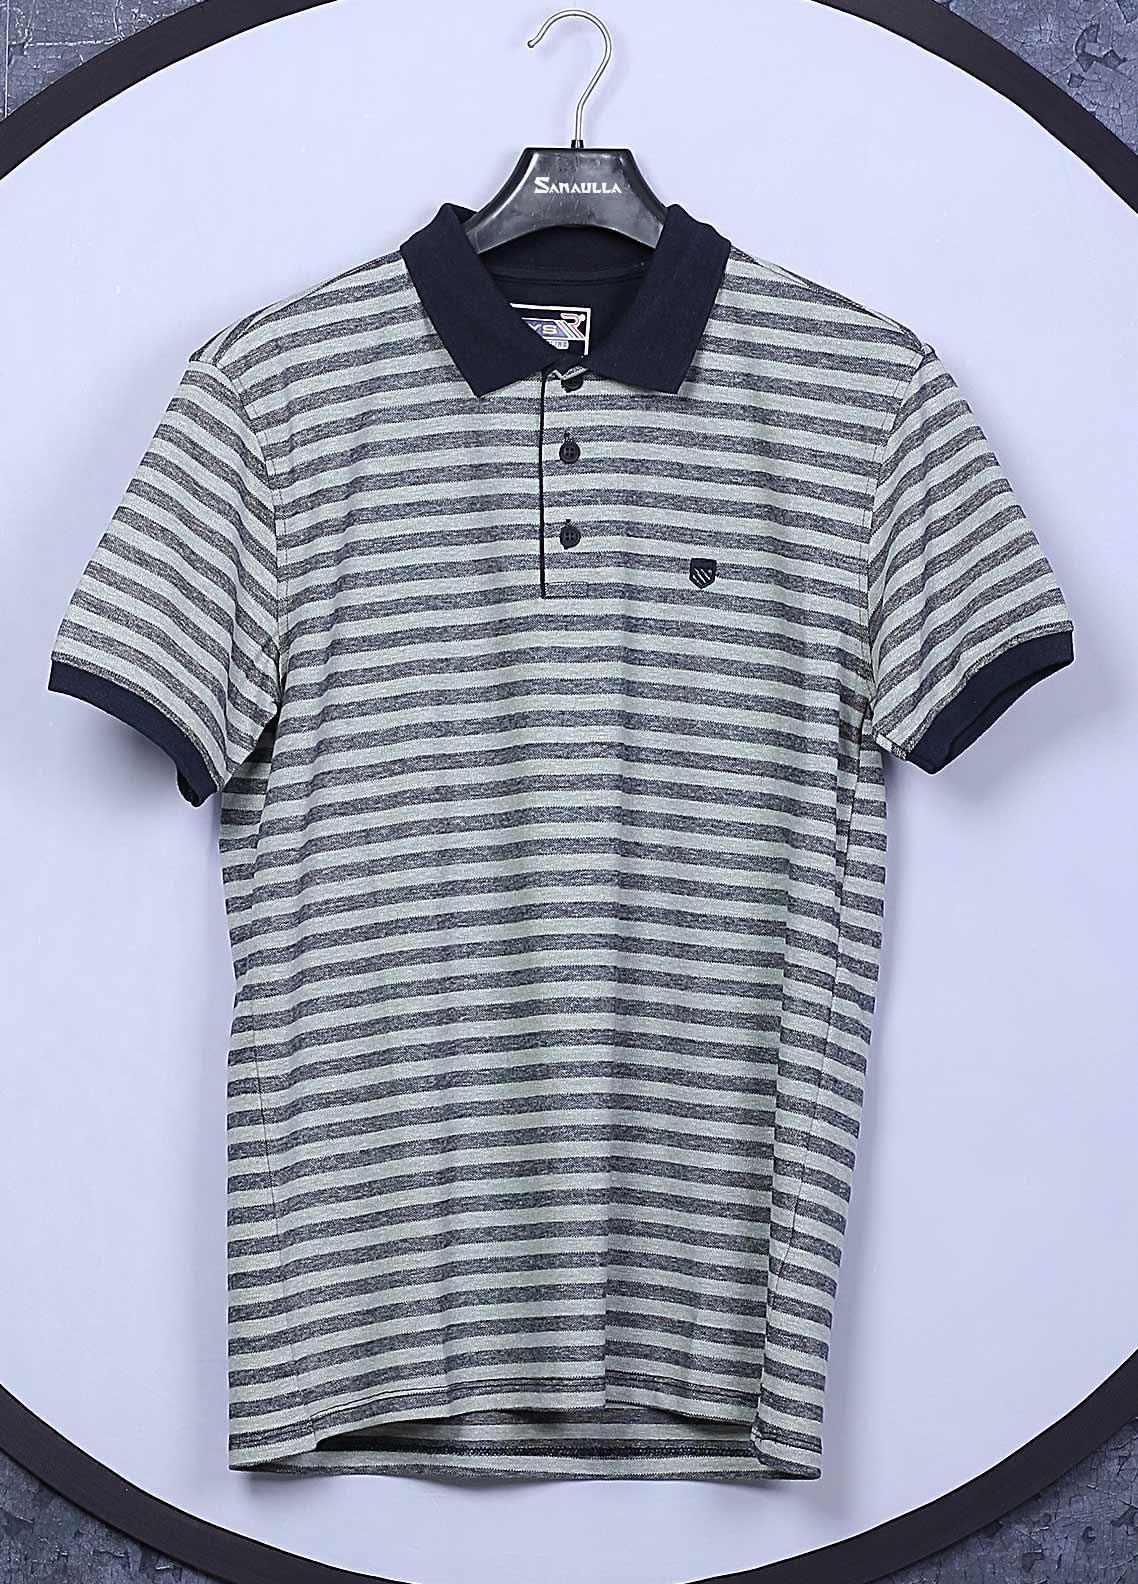 Sanaulla Exclusive Range Cotton Casual T-Shirts for Men -  5004 Green